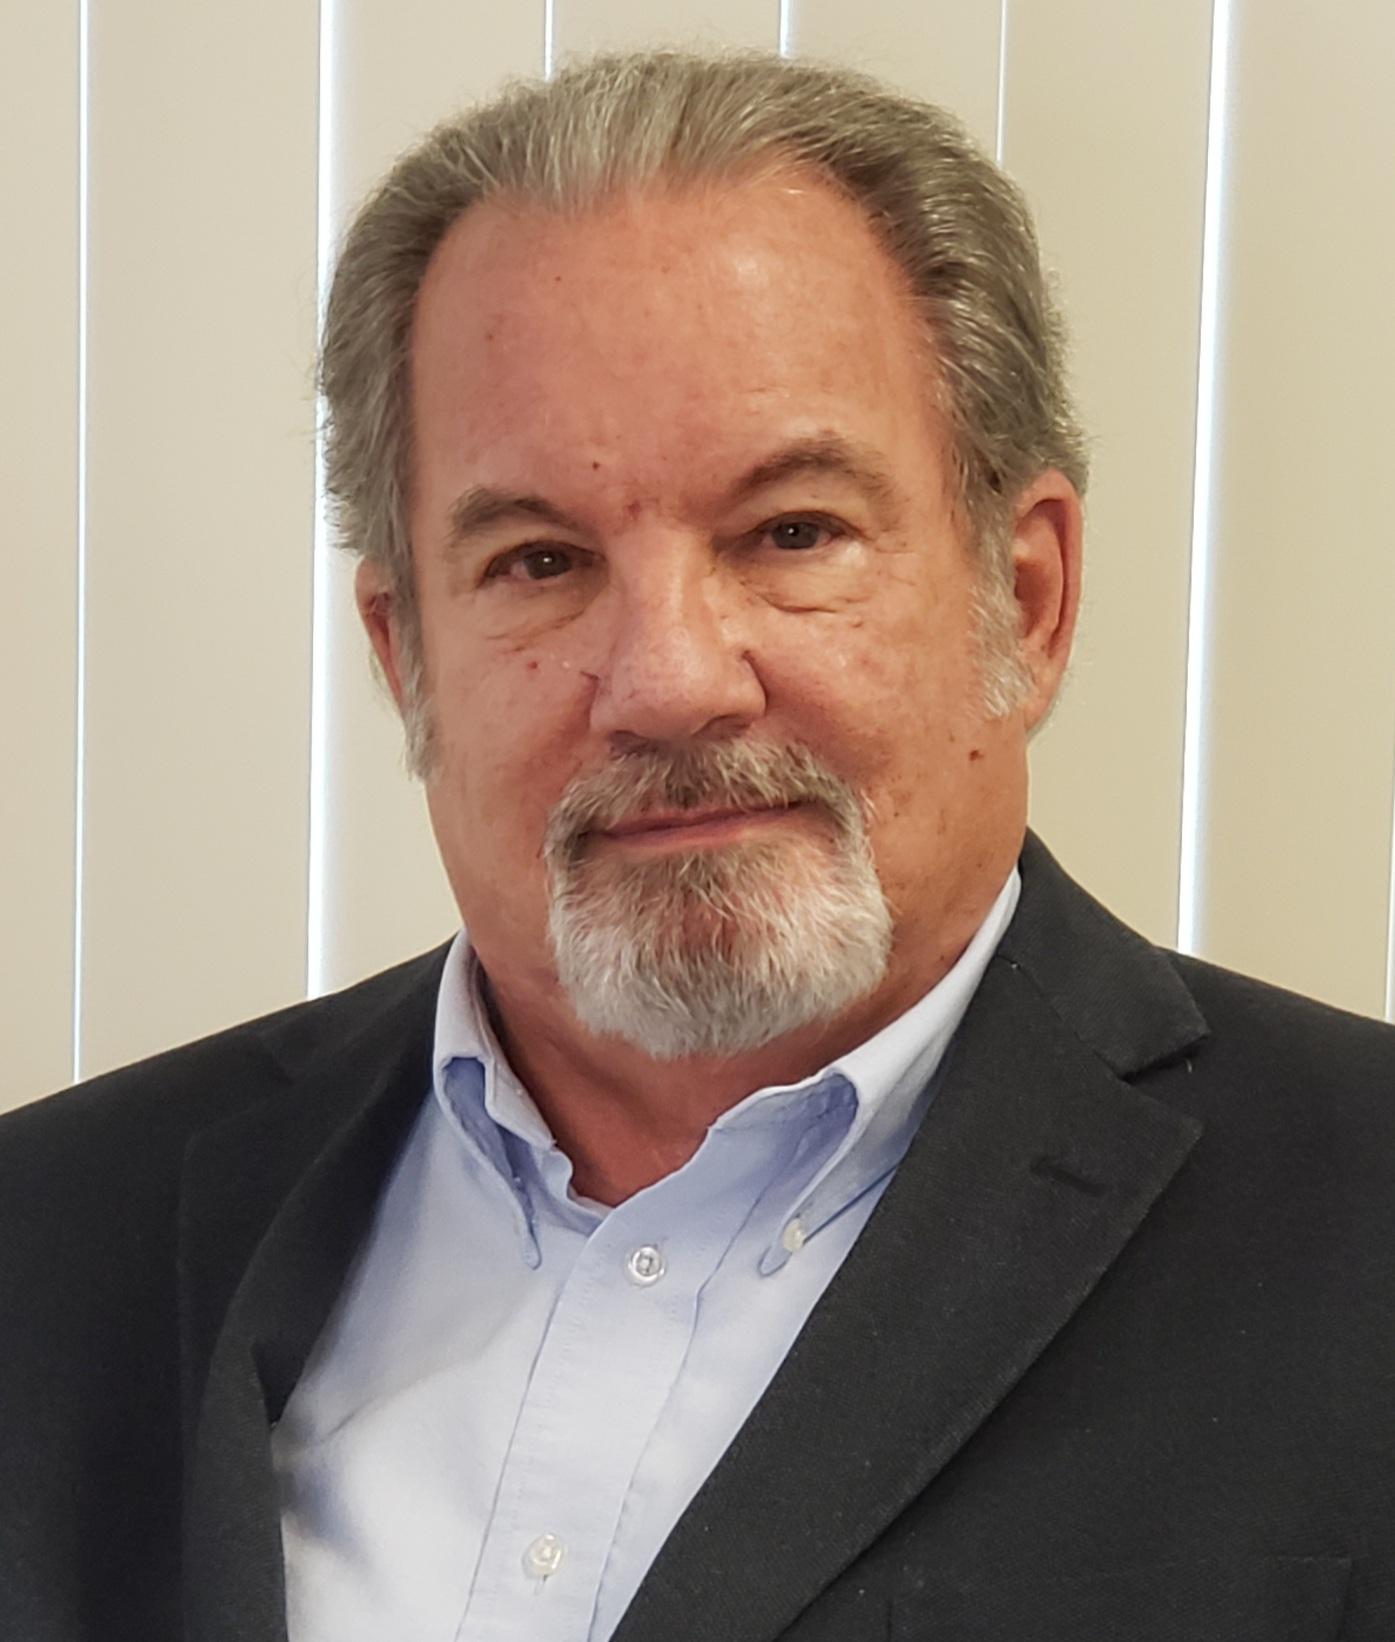 Gary Heidel